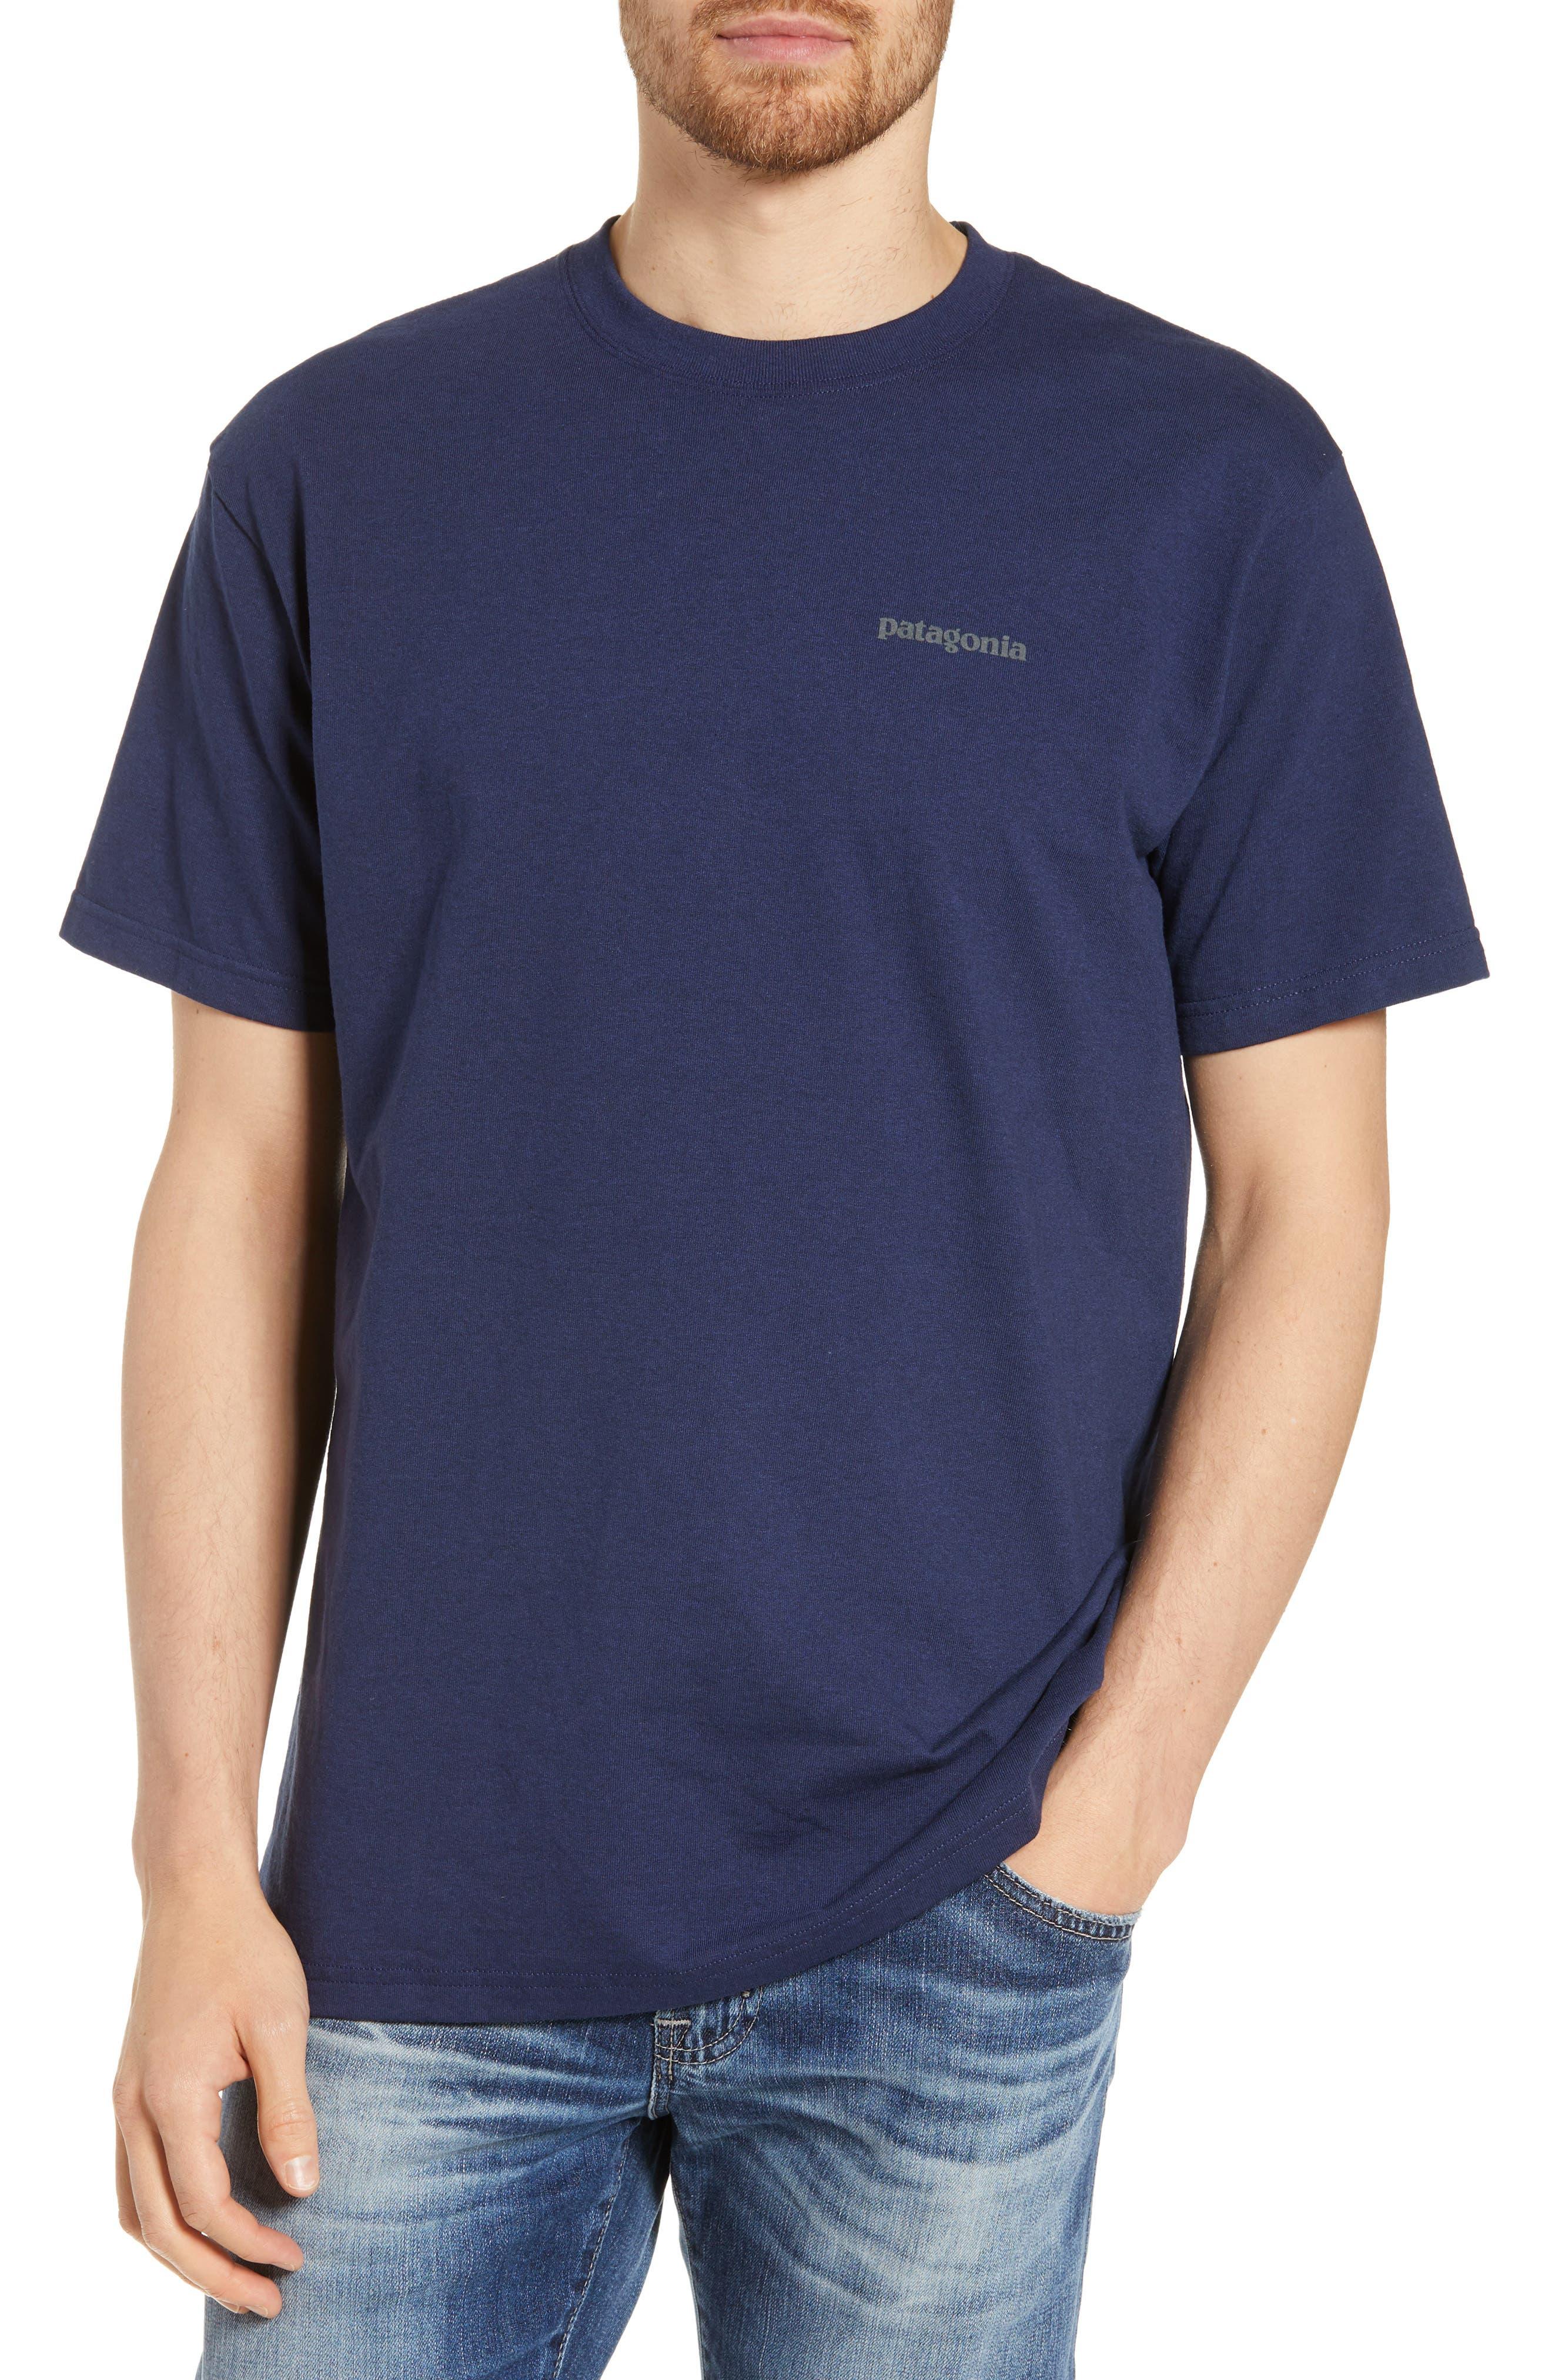 Patagonia Fitz Roy Smallmouth Responsibili-Tee Regular Fit T-Shirt, Blue